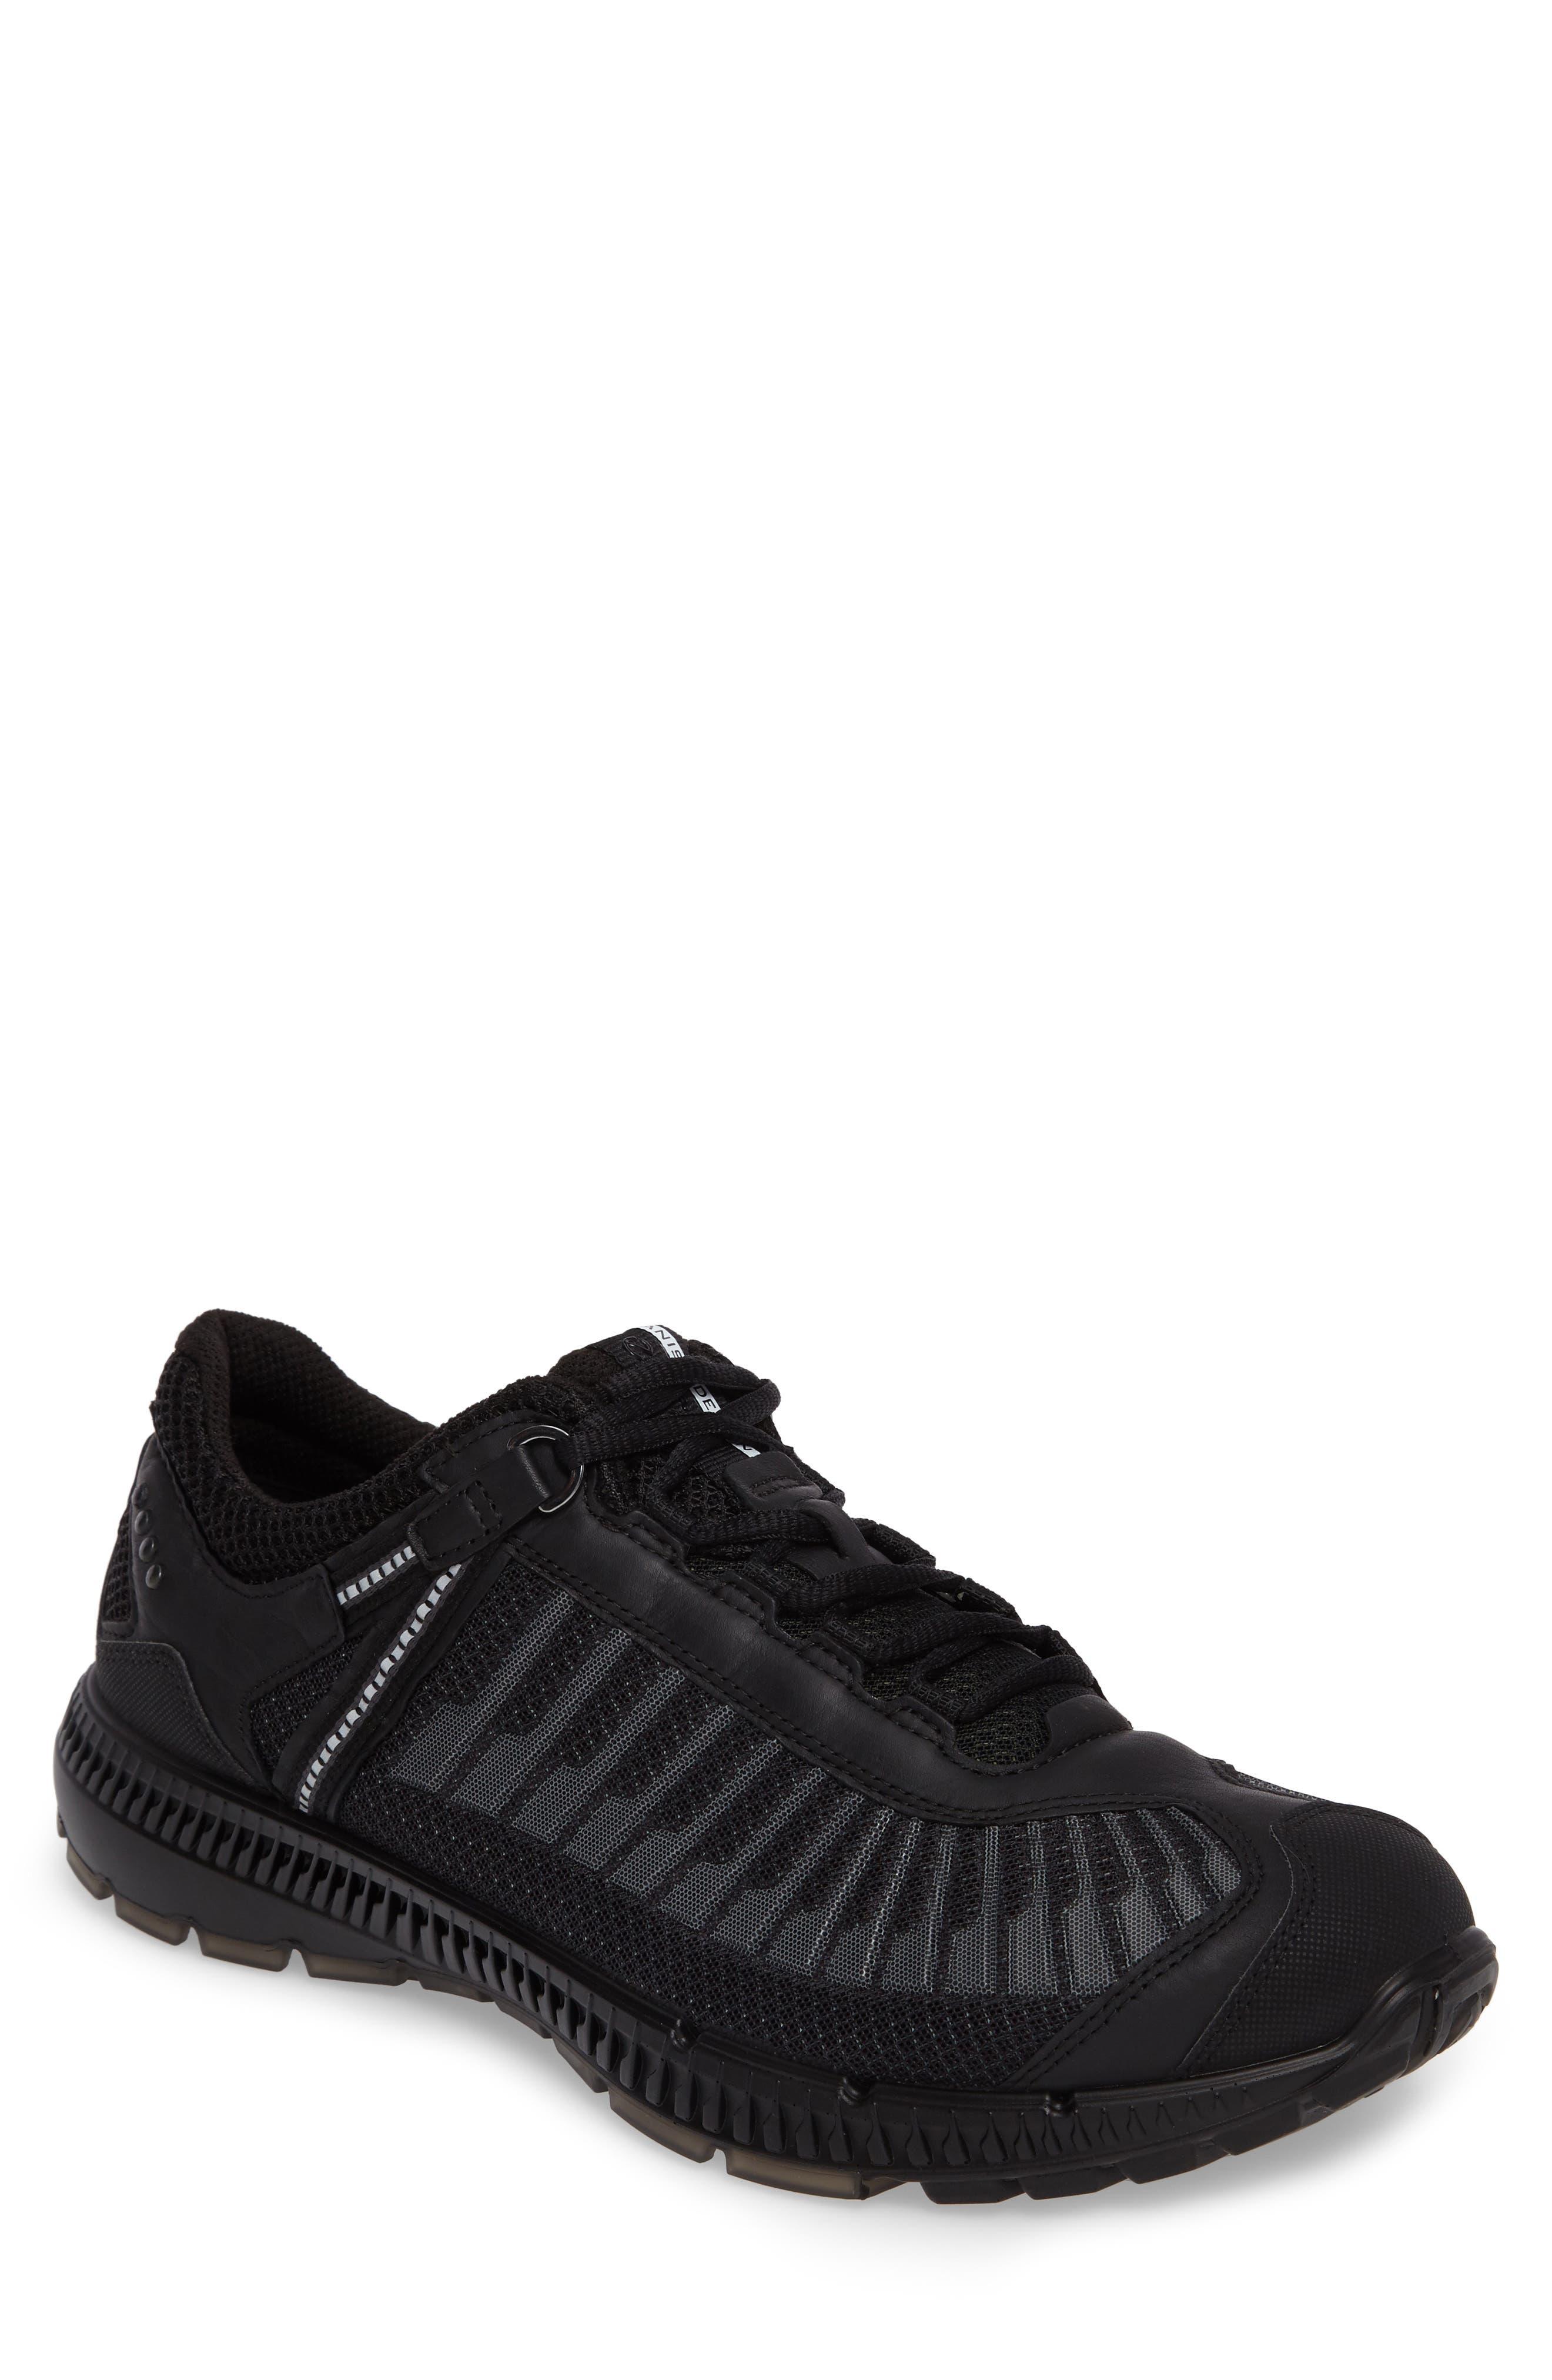 Intrinsic TR Run Sneaker,                         Main,                         color,